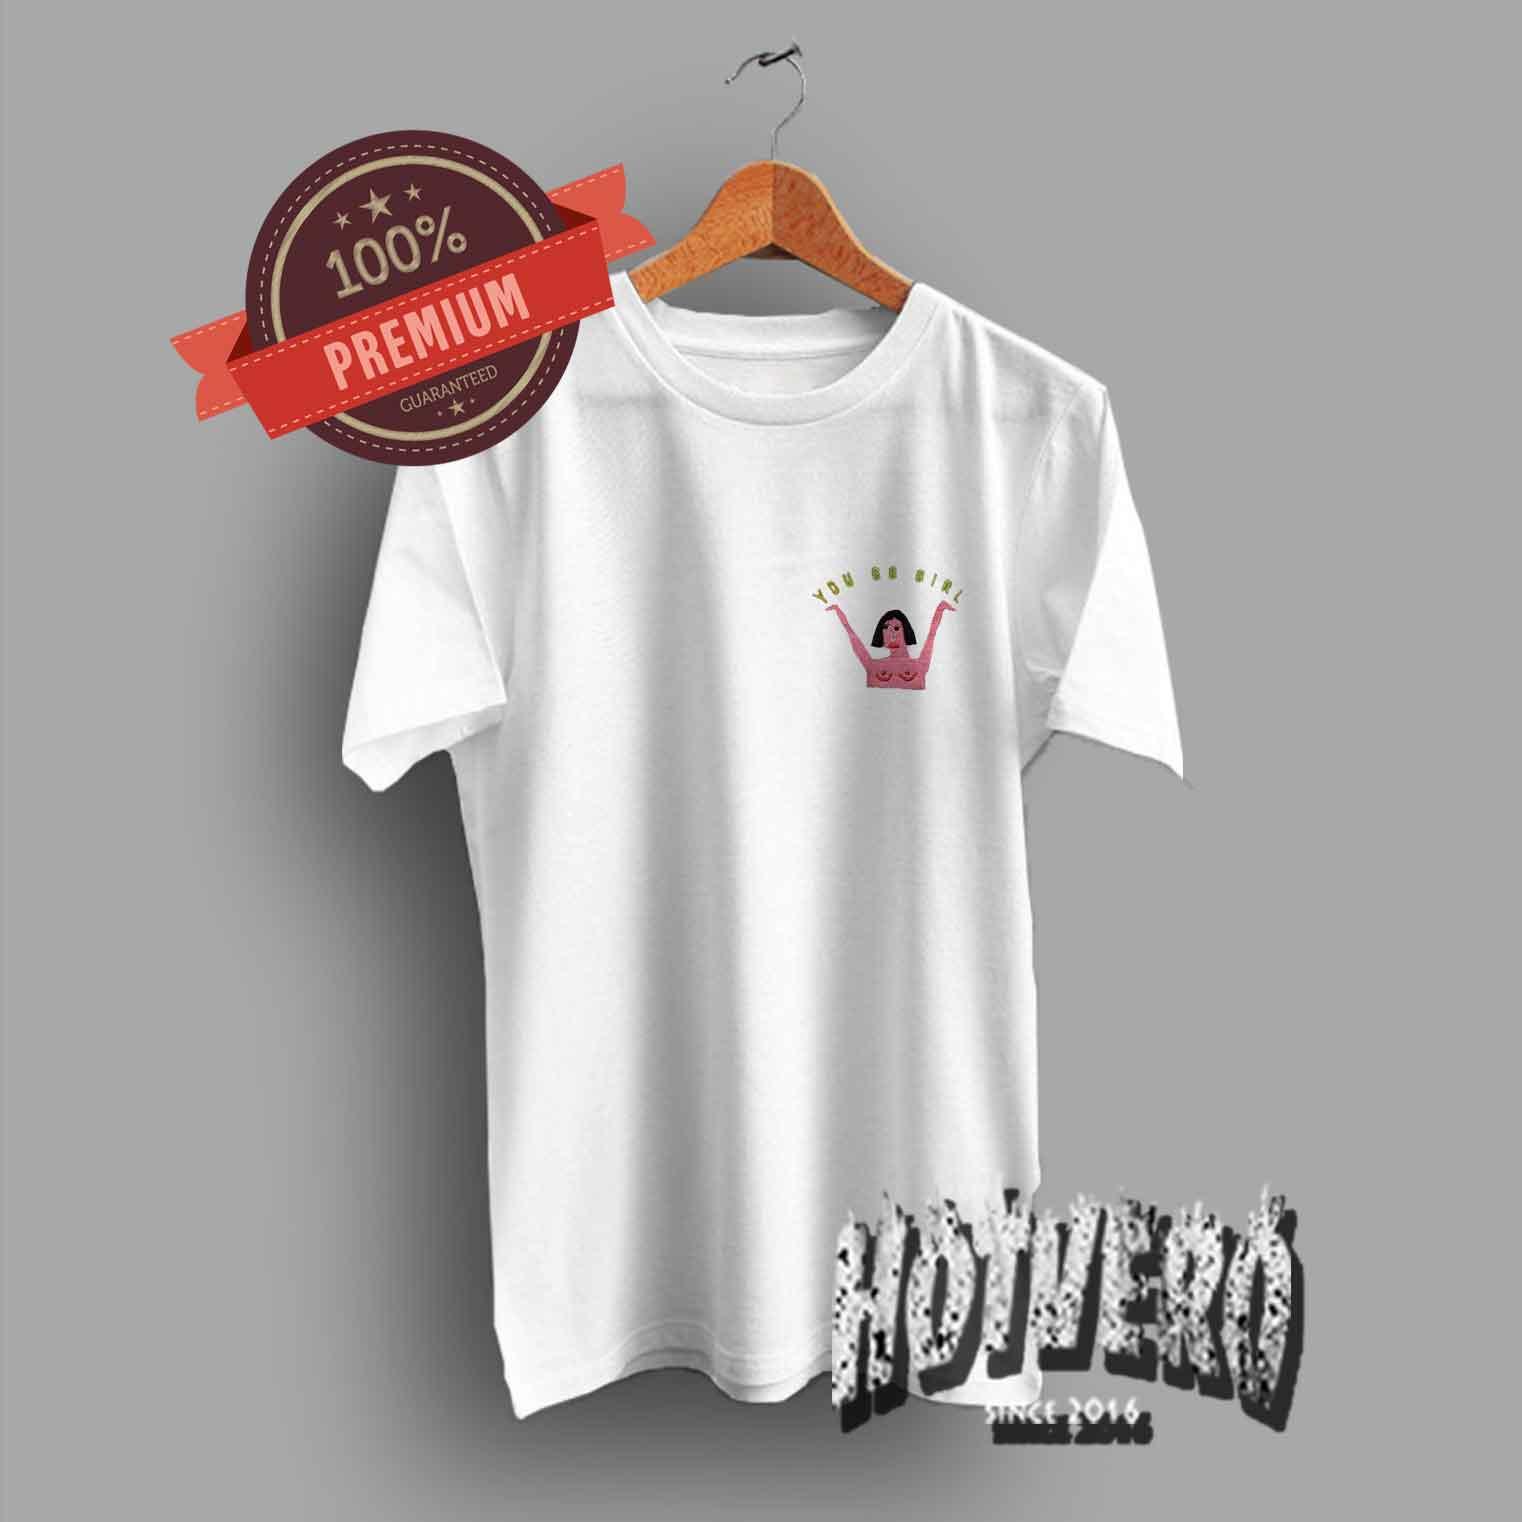 You Go Girl Cute T Shirt For Teen - HotVero